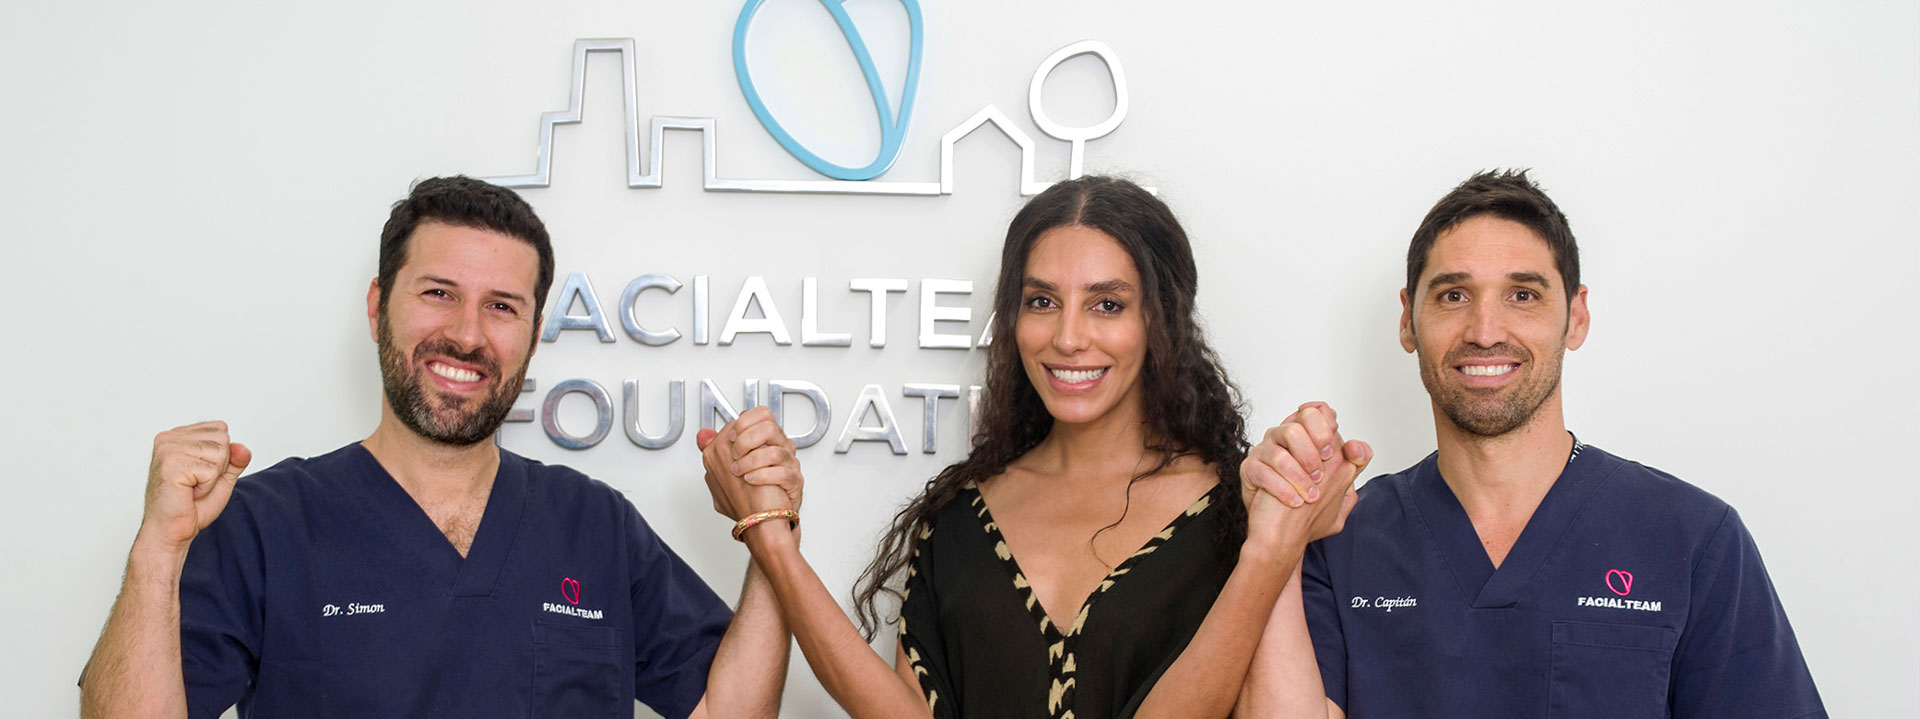 Transgender Surgery access, a social responsibility program